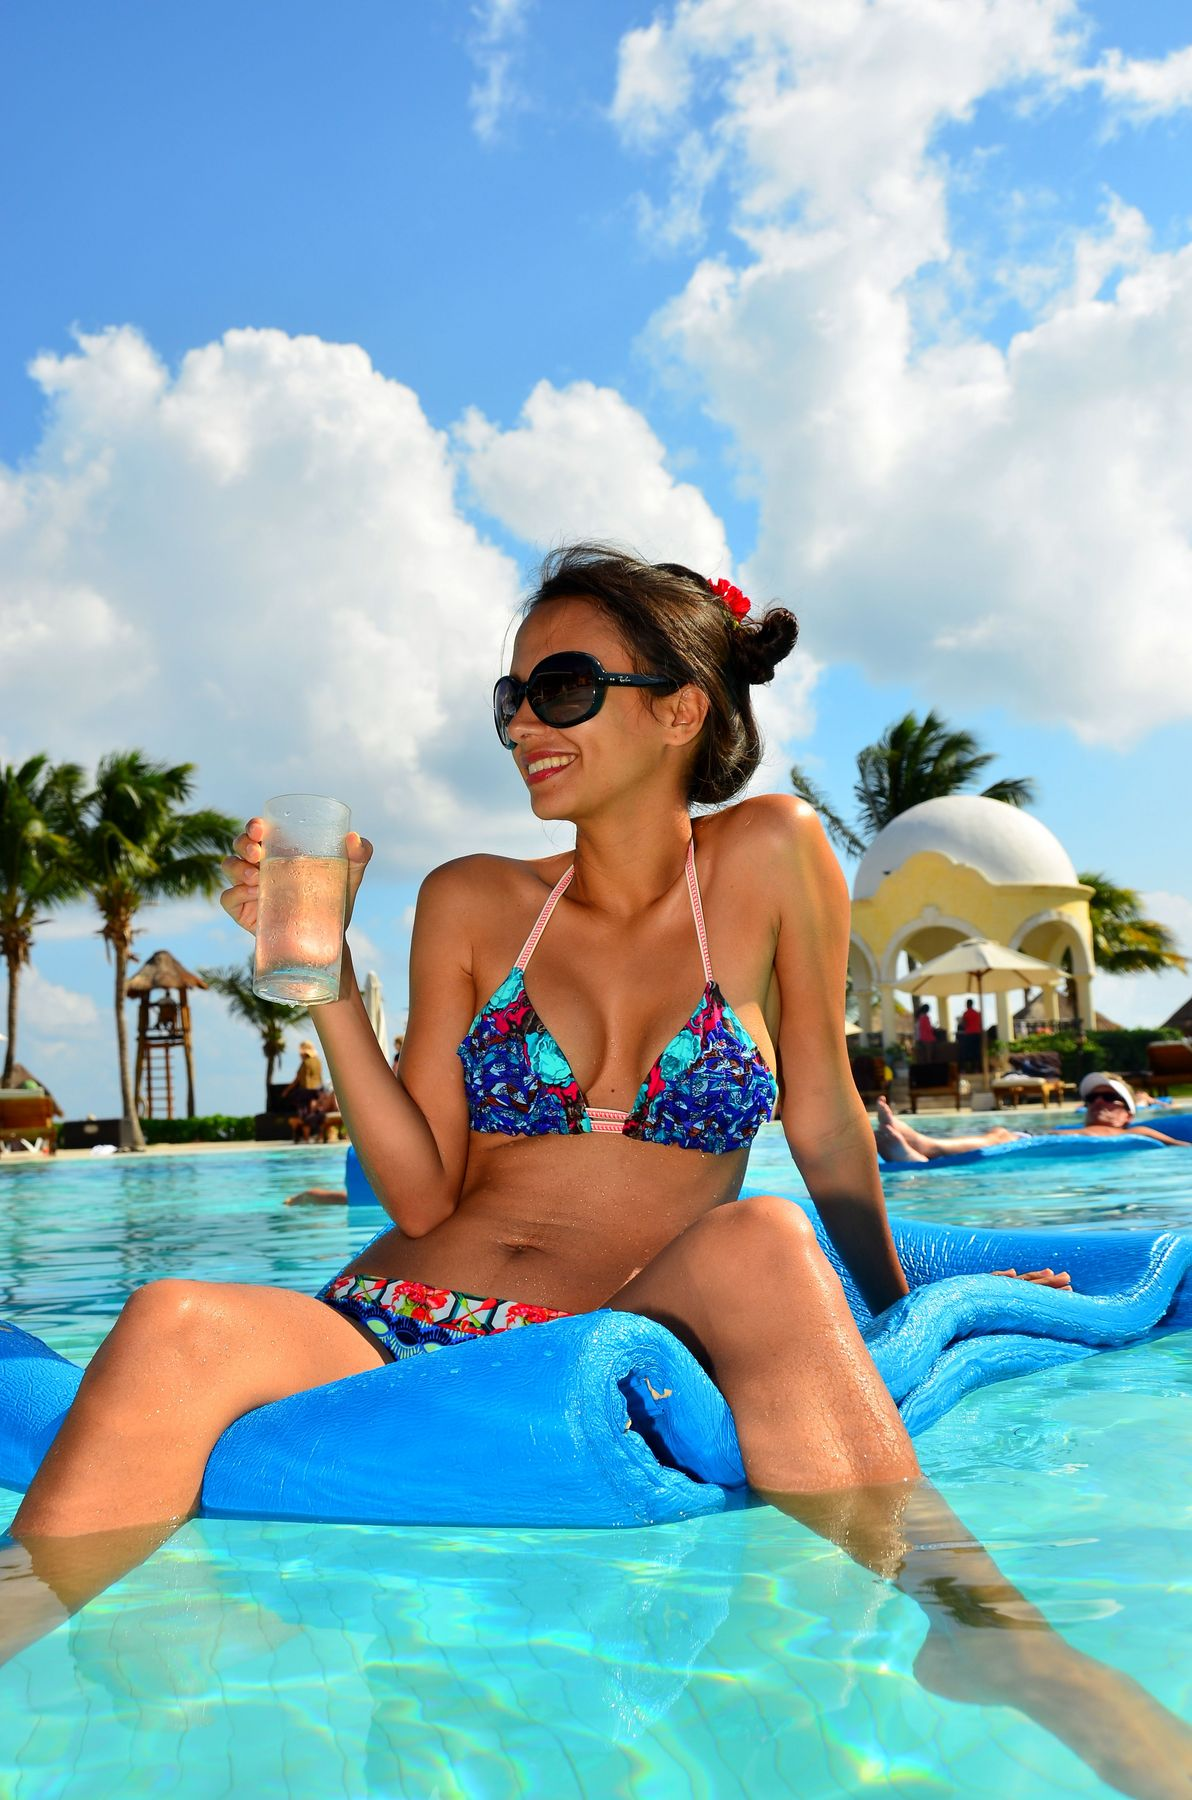 Yoanna_at_The_Pool